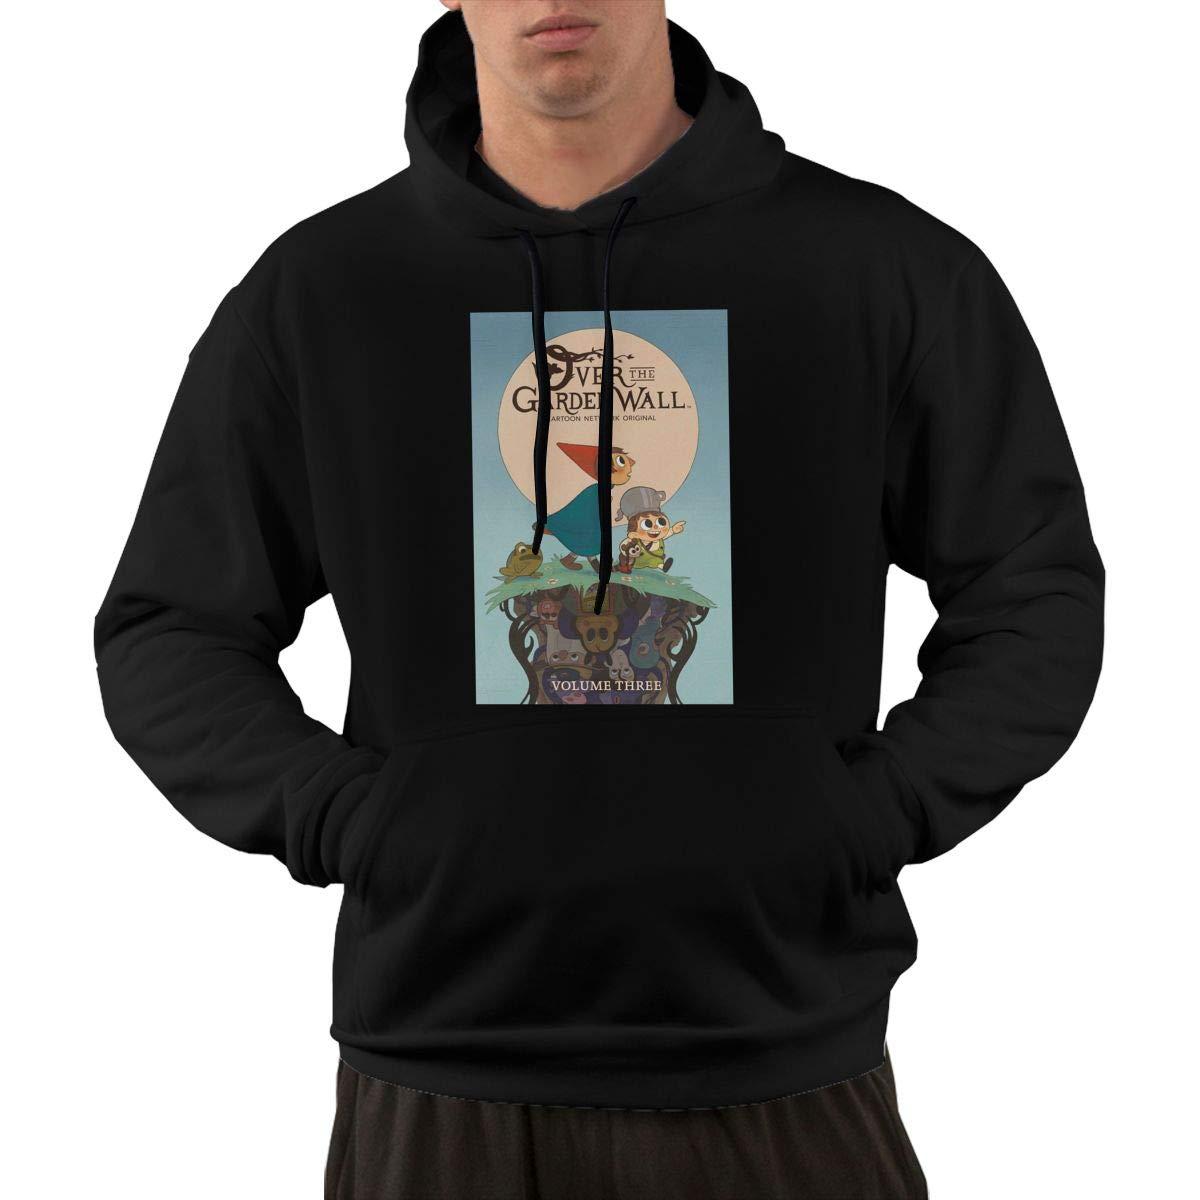 Eowlte Over The Garden Wall Men Long Sleeve Casual Hooded Pocket Sweatshirt Black S